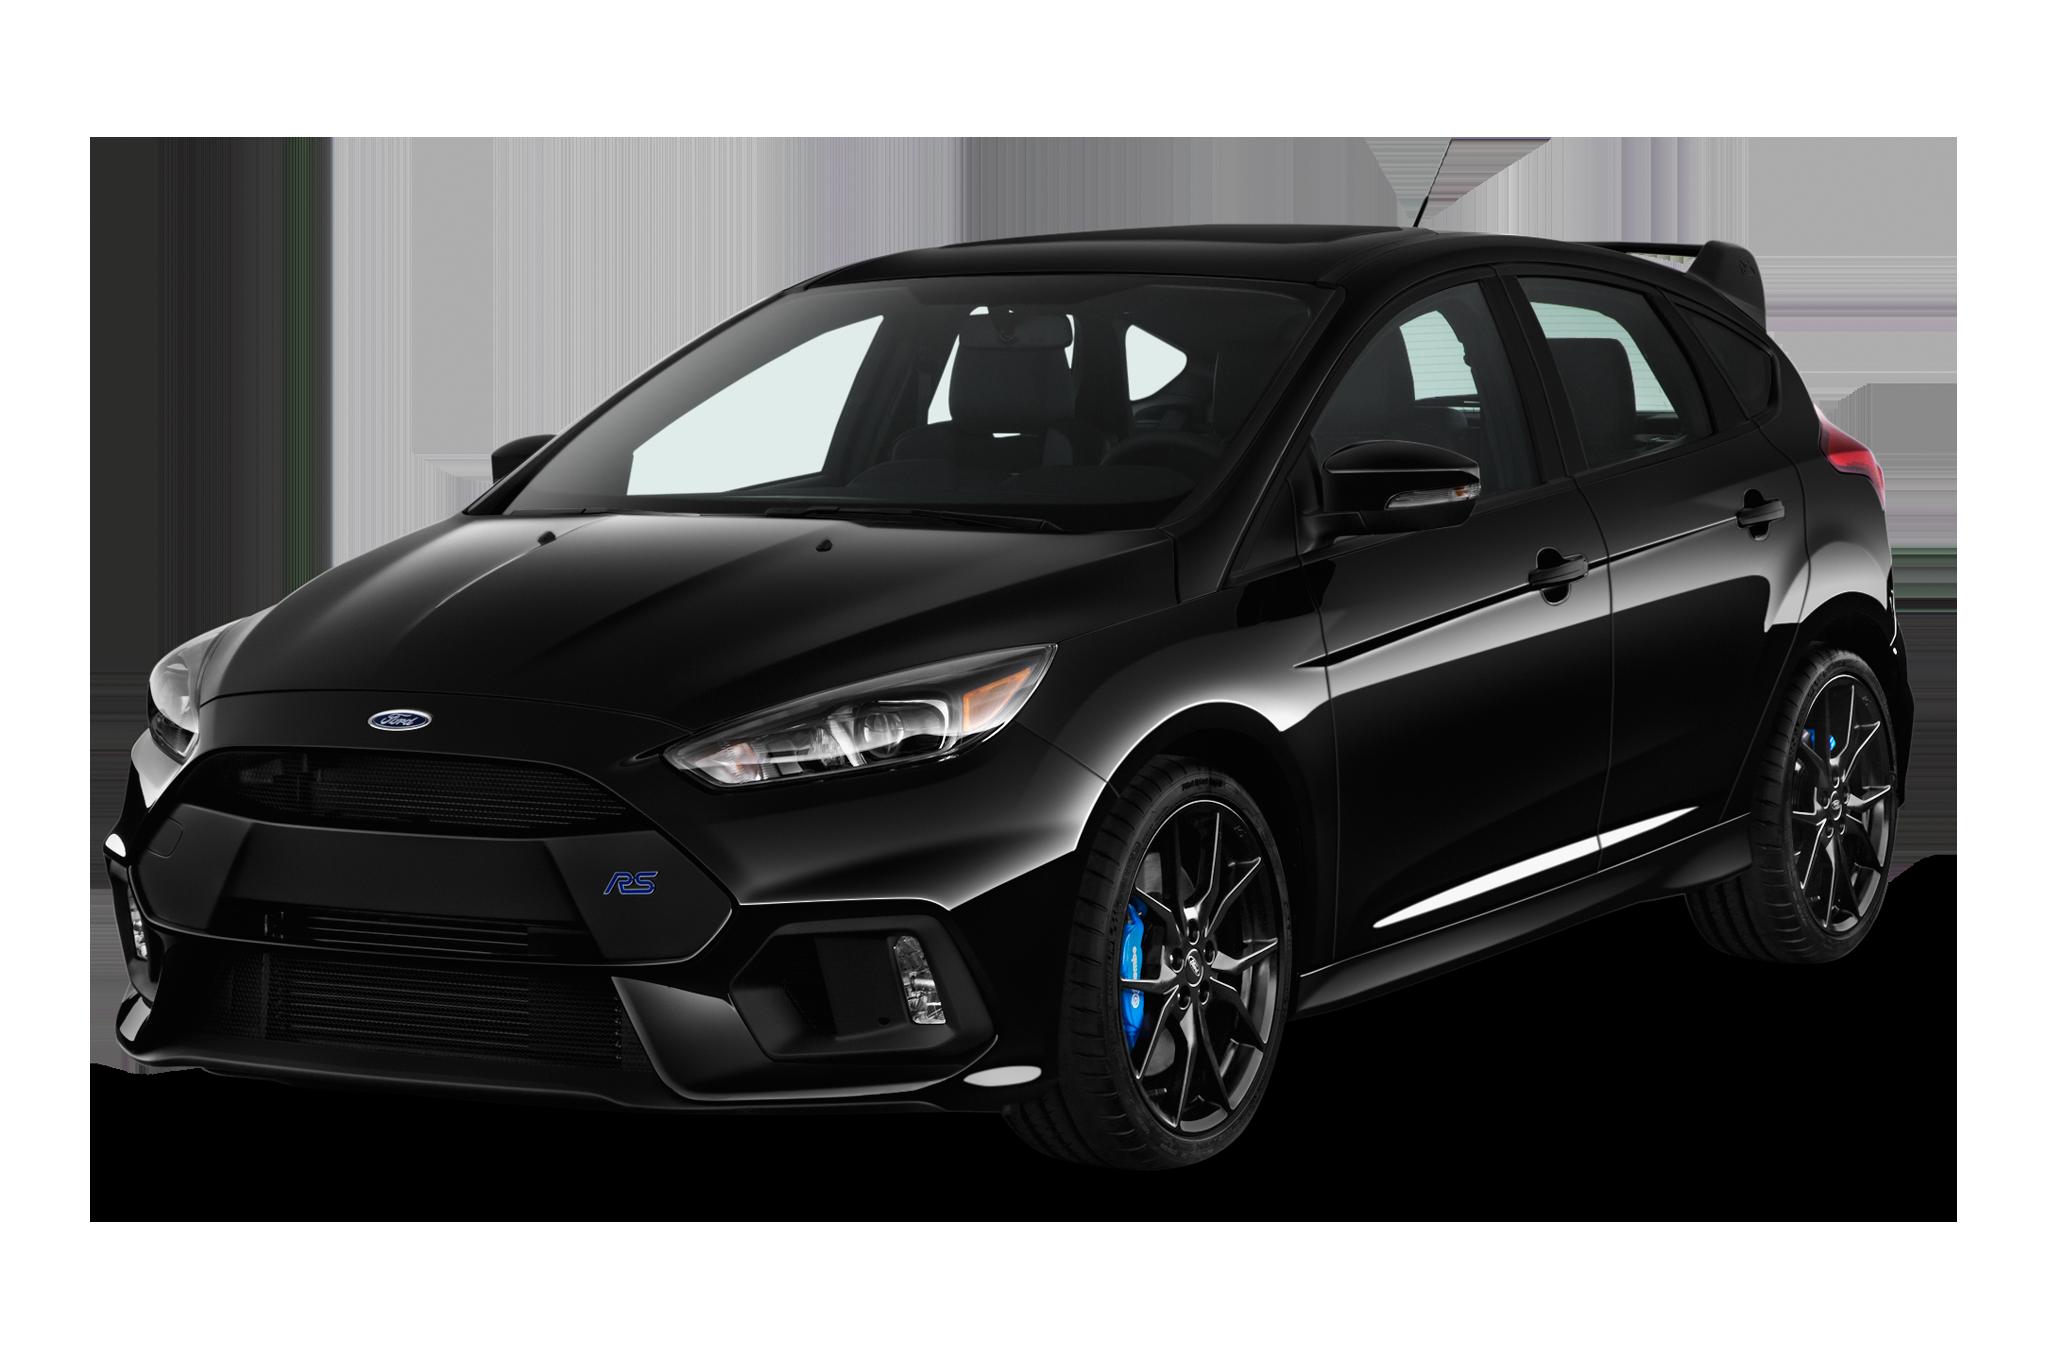 2018 ford focus hatch rs overview msn autos. Black Bedroom Furniture Sets. Home Design Ideas